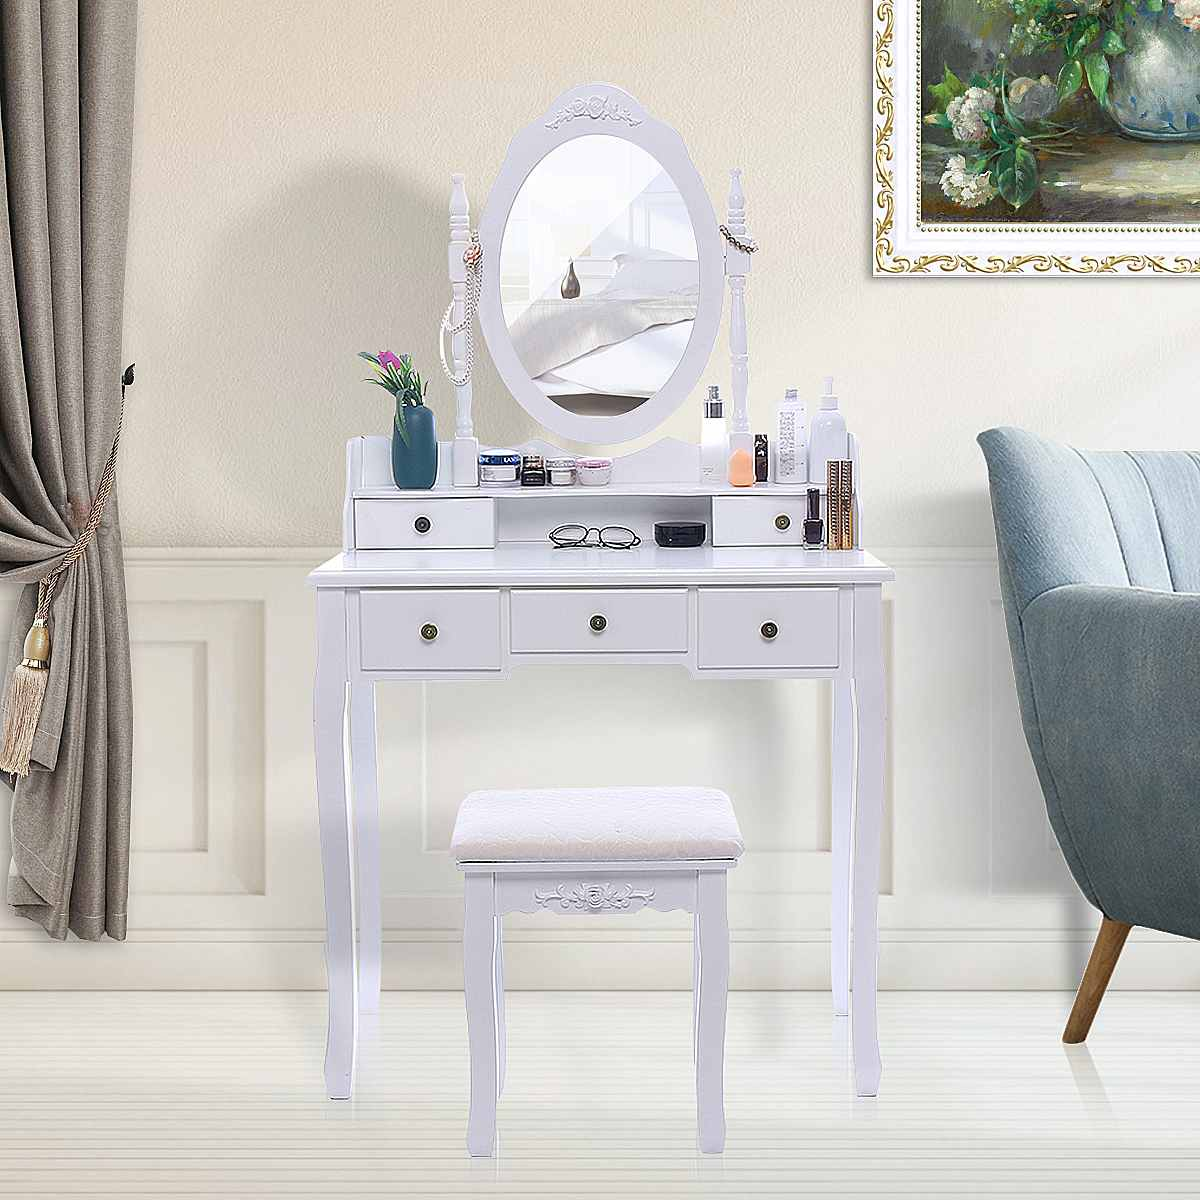 Bedroom Furniture Modern White Dresser Vanity Makeup Dressing Table Set Concise 5 Drawer Jewelry Organizer Mirror Dresser Chair